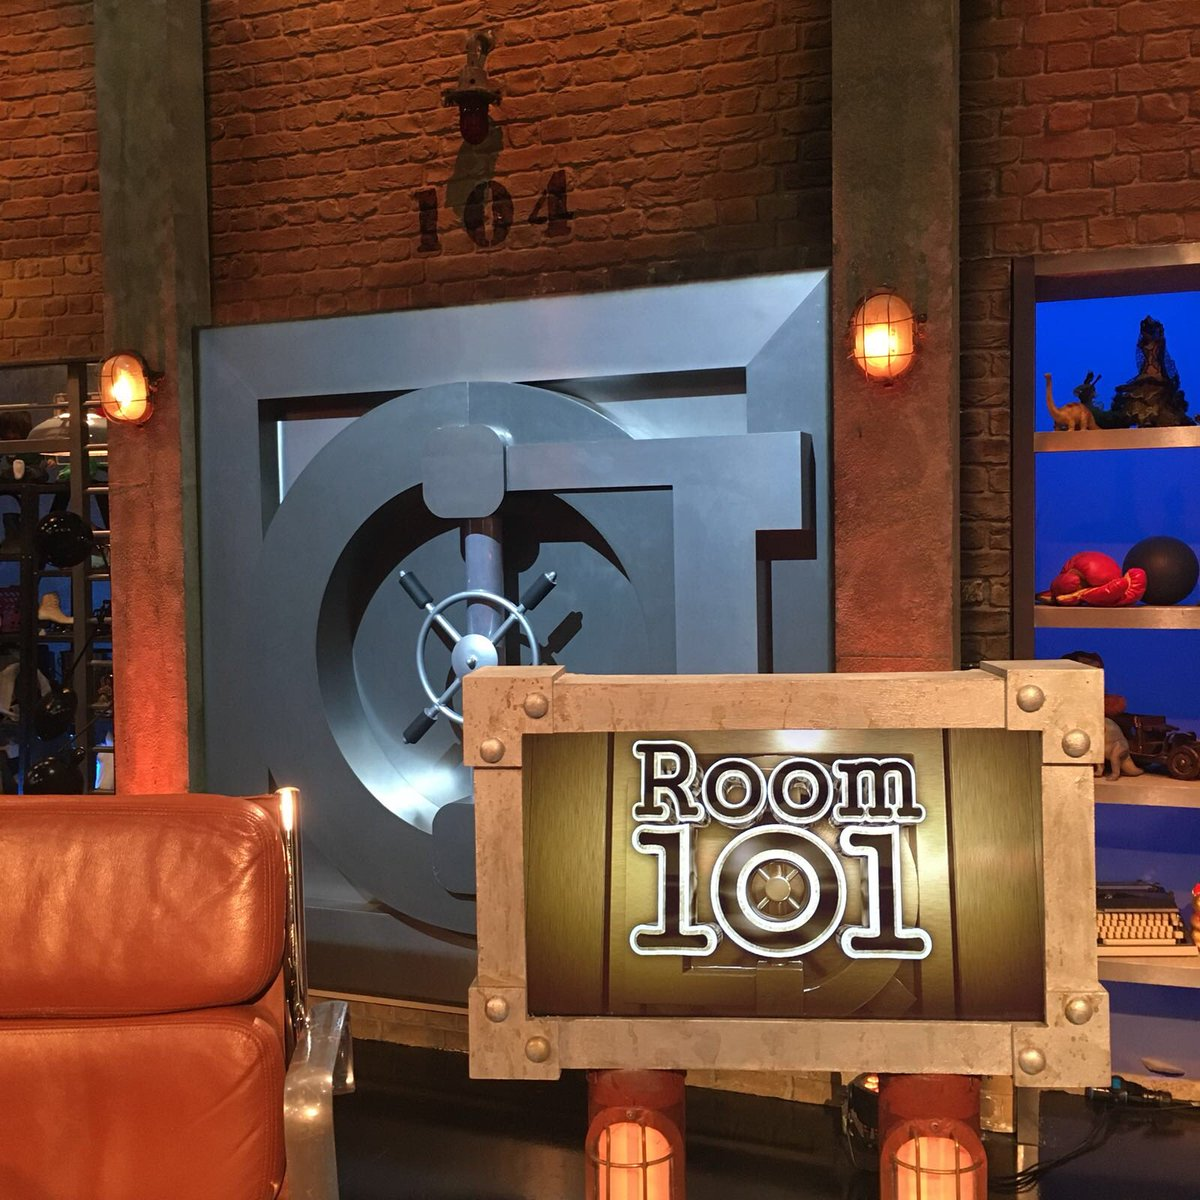 Room 101 (@Room101_Hat)